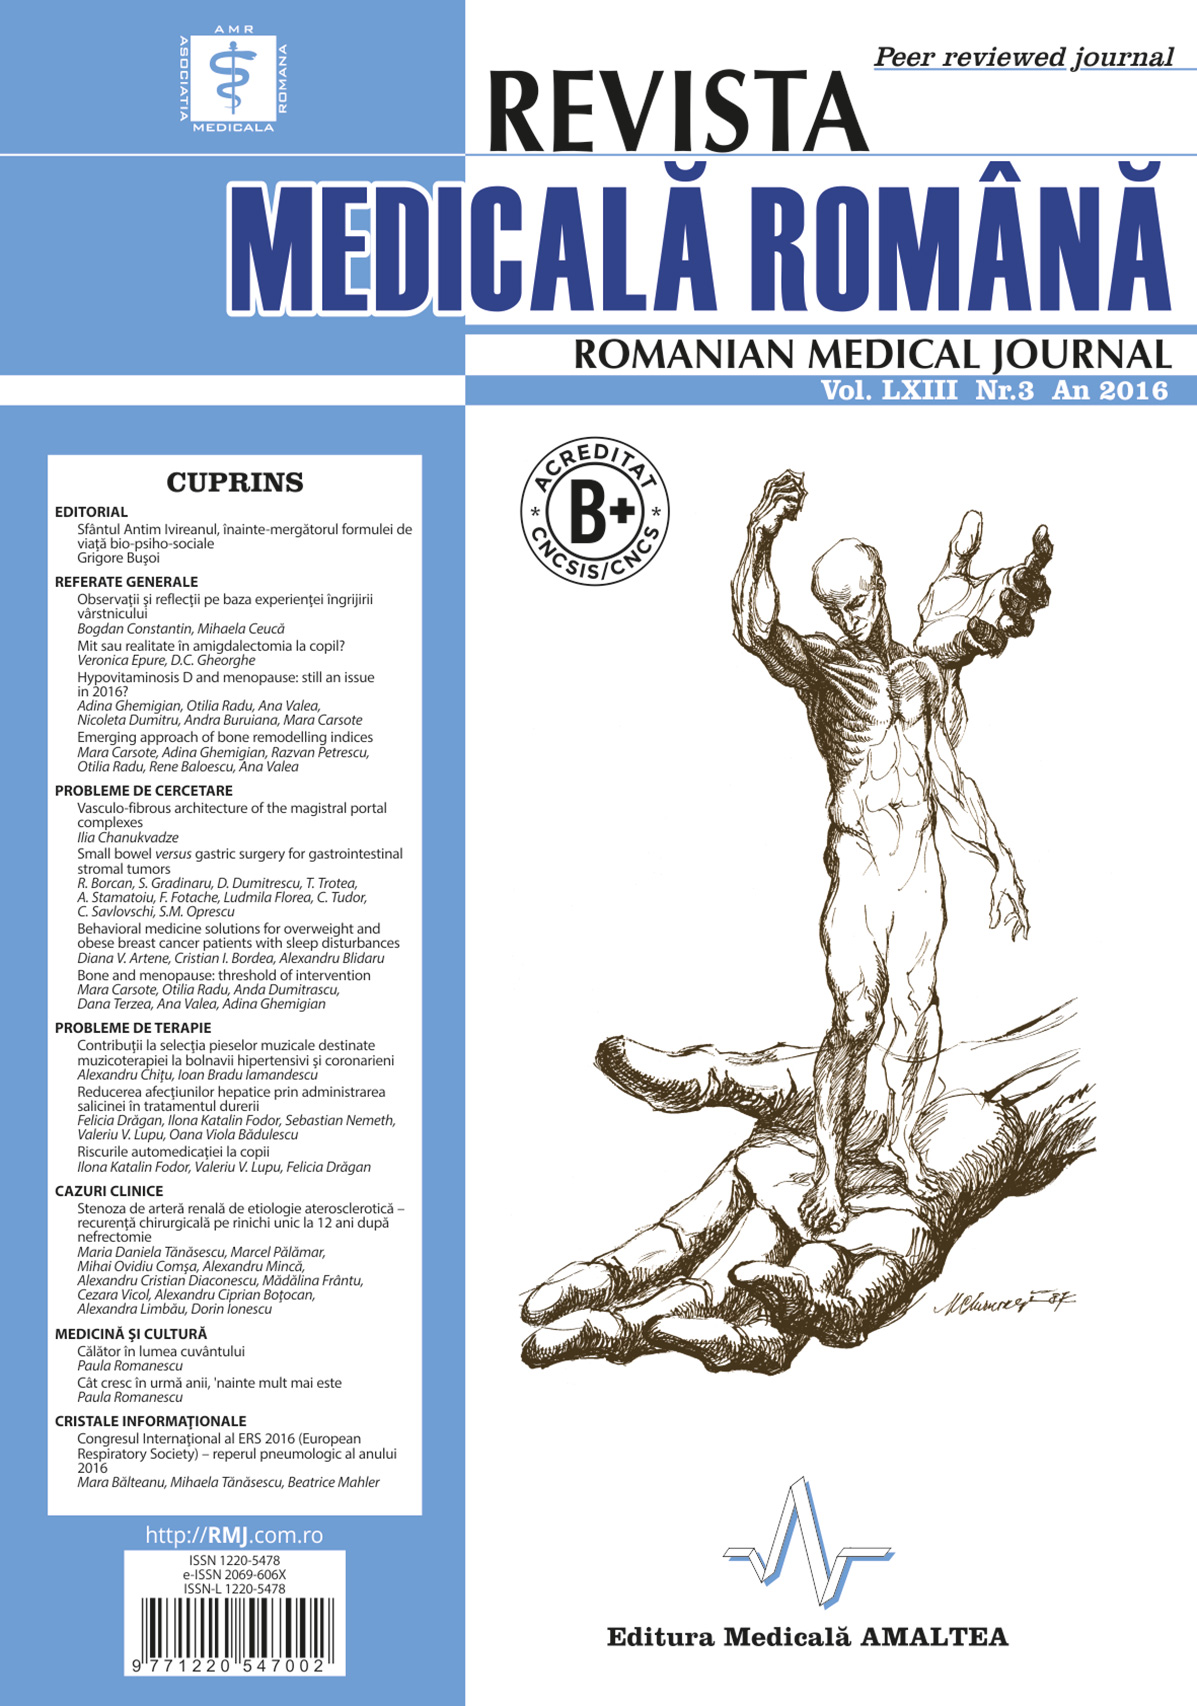 REVISTA MEDICALA ROMANA - Romanian Medical Journal, Vol. LXIII, Nr. 3, An 2016